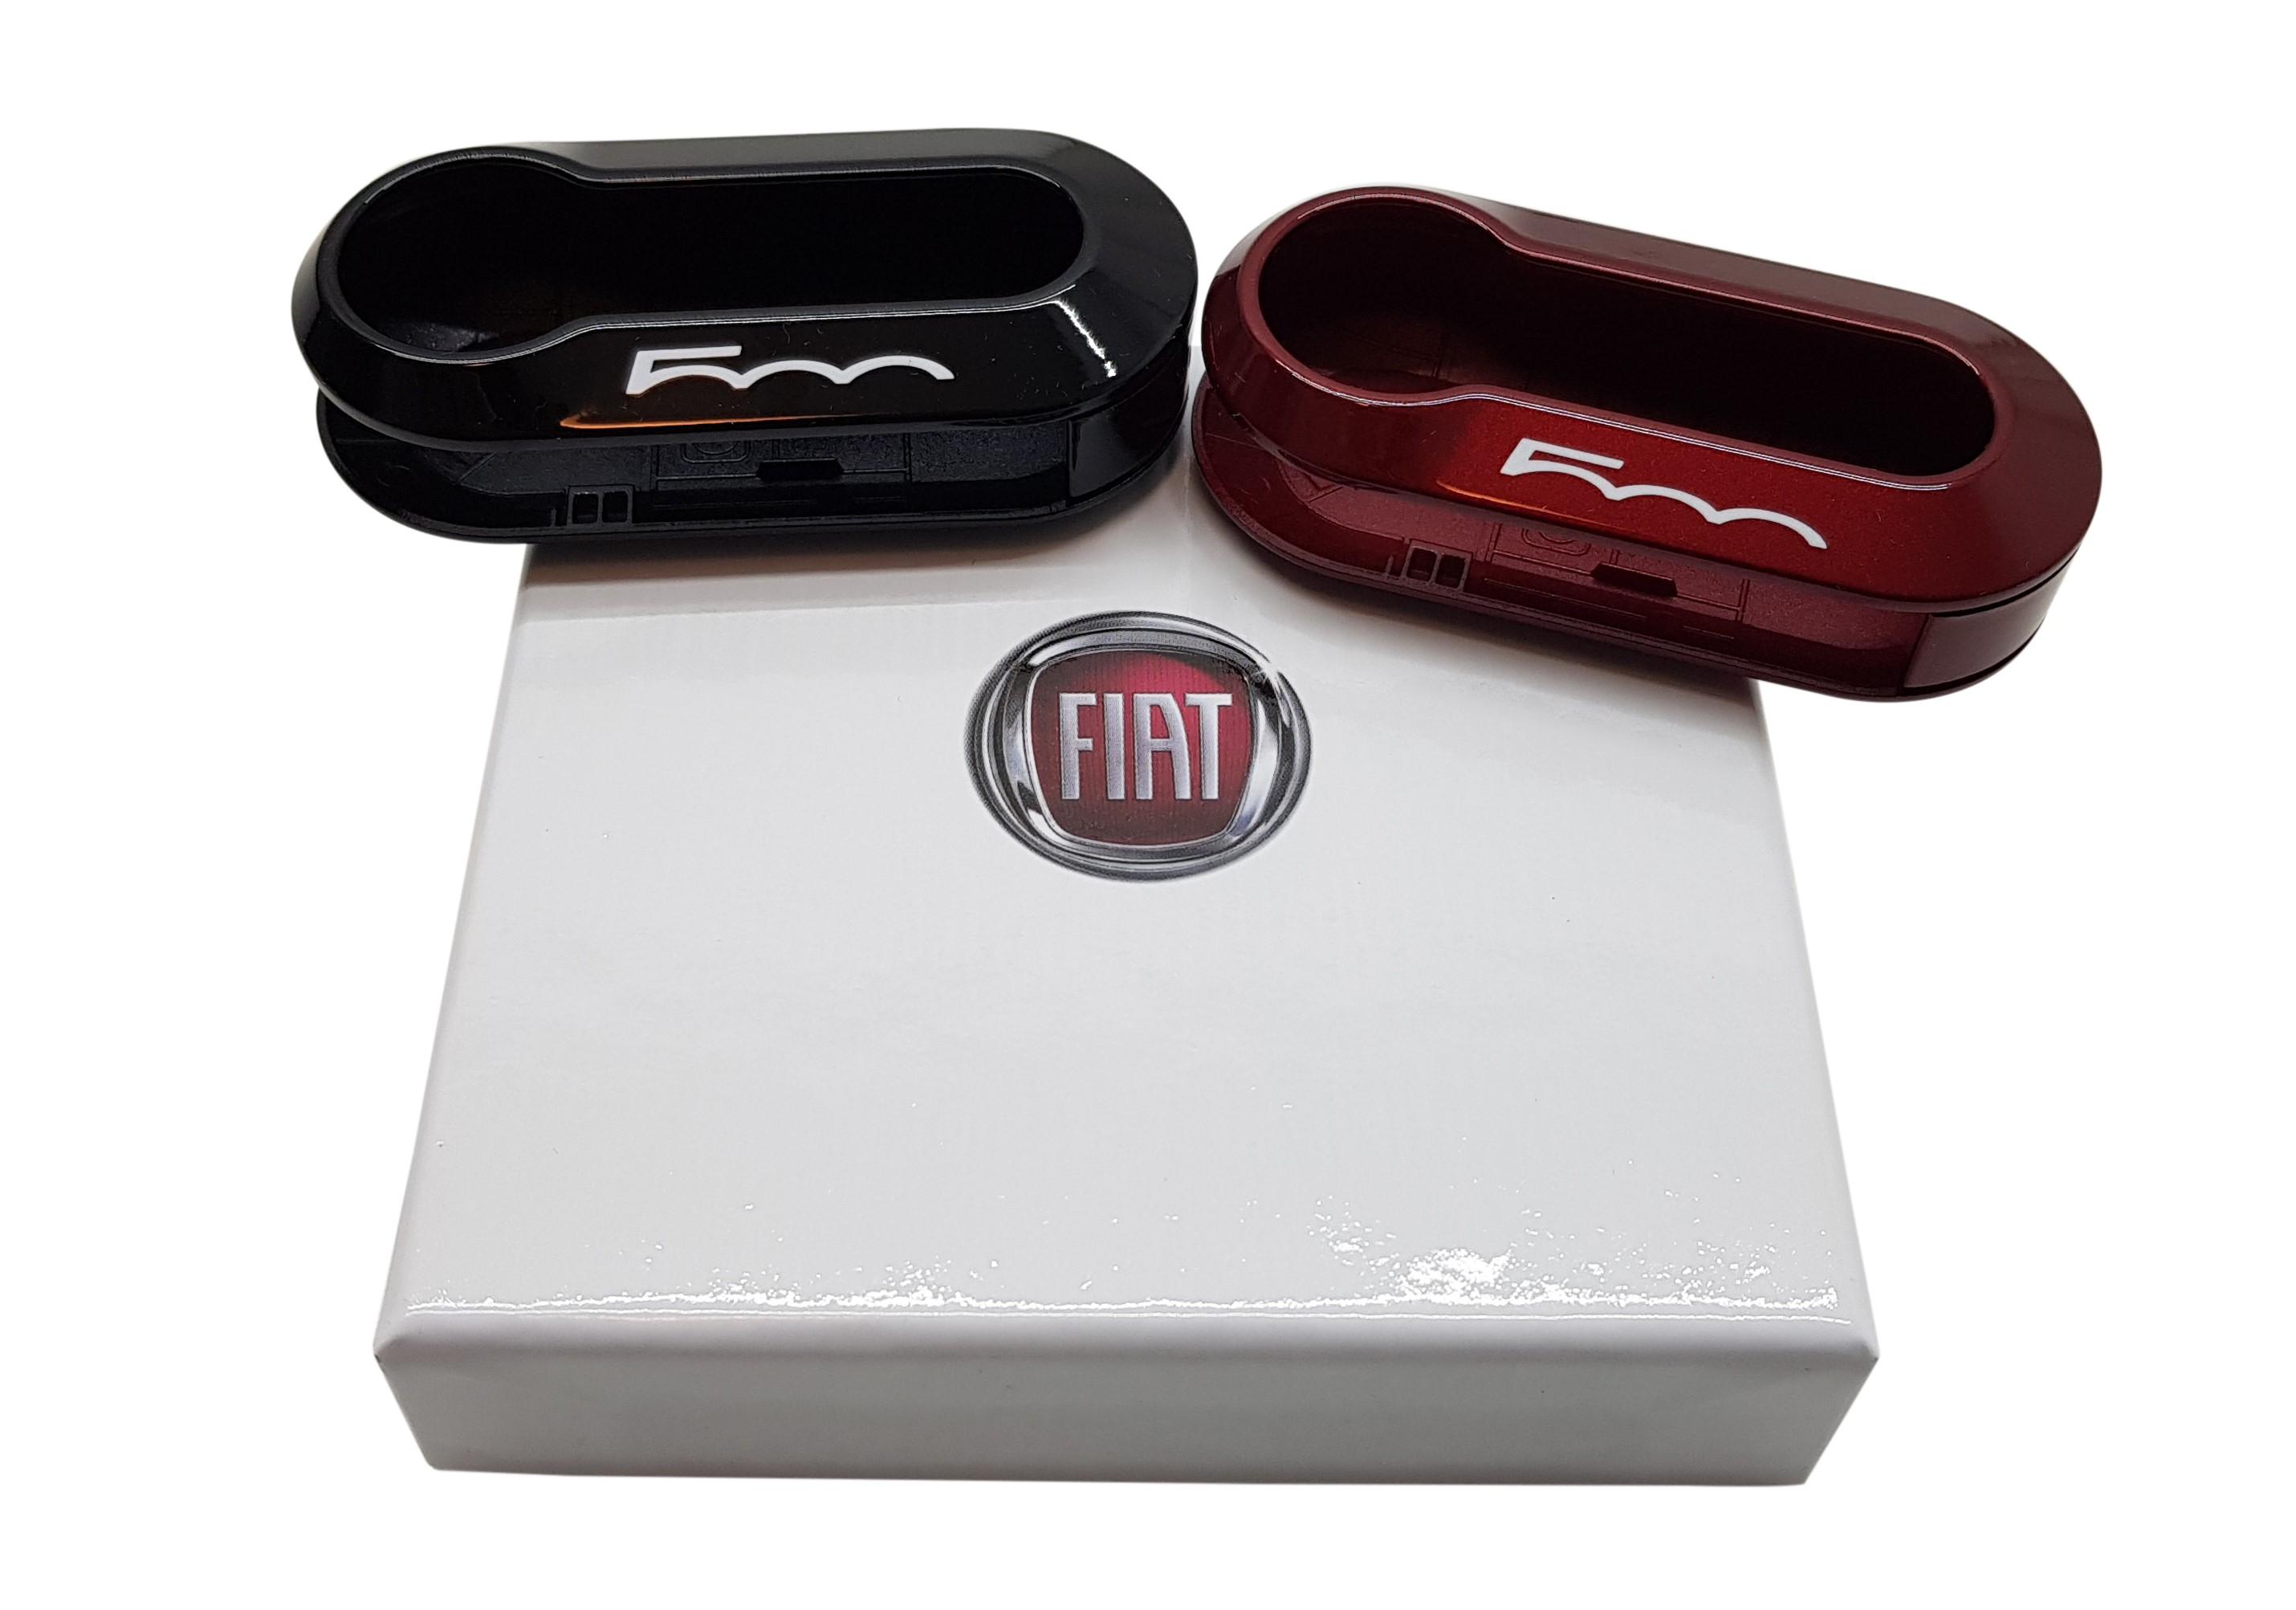 Original Fiat Schlüsselcover Set bordeaux rot /& schwarz Fiat 500 Logo 50927026